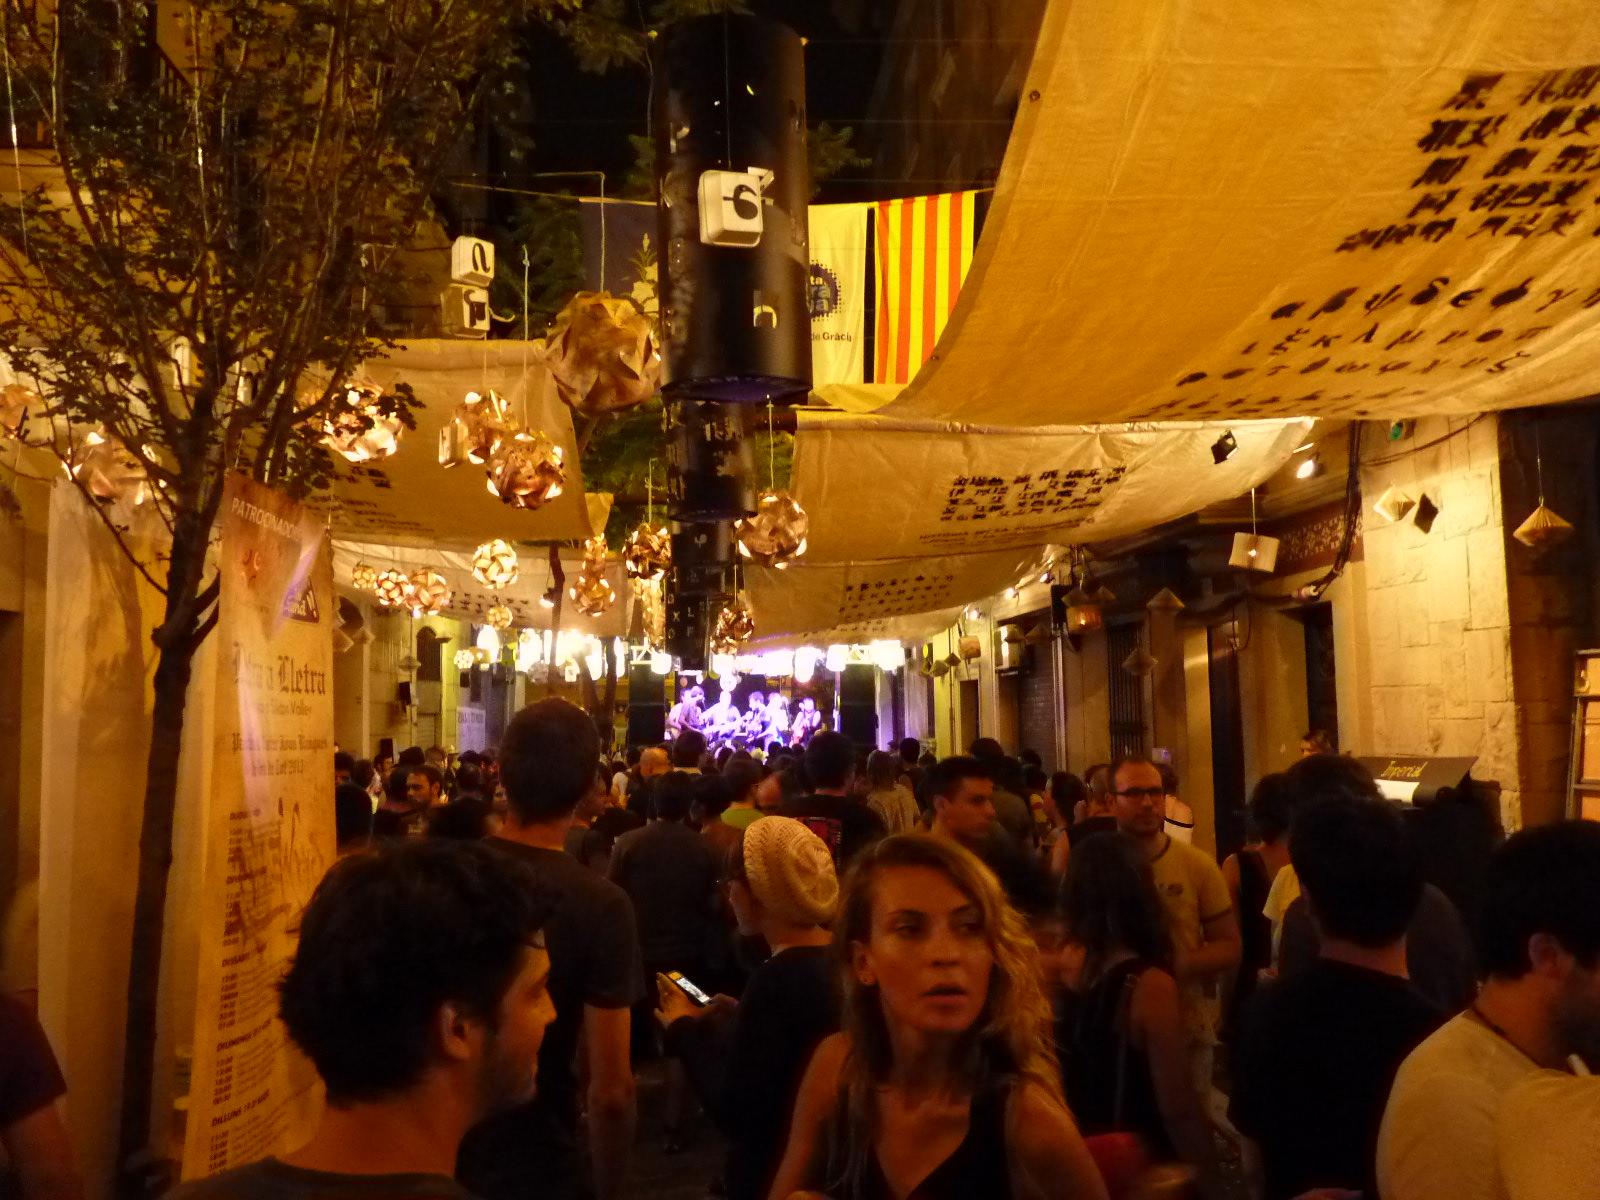 Festival-Gracia-Asia-Street.jpg